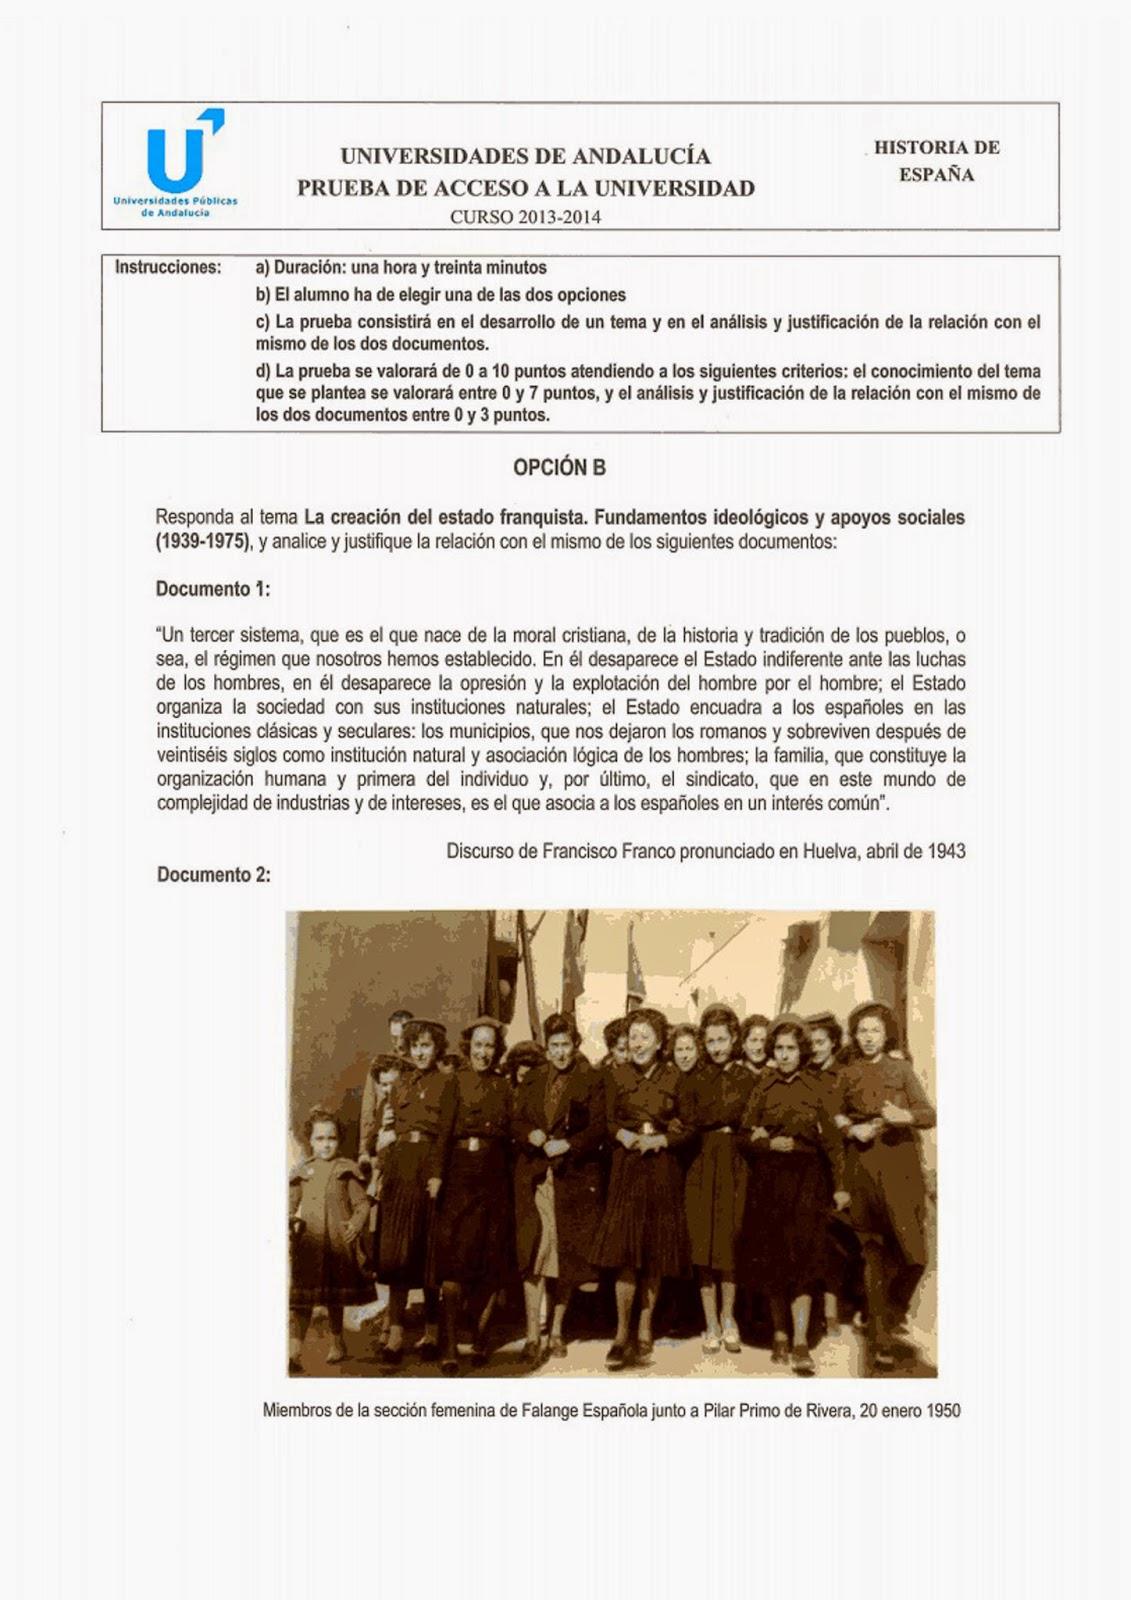 PAU Historia de España septiembre 2014 Andalucía Opción B Selectividad